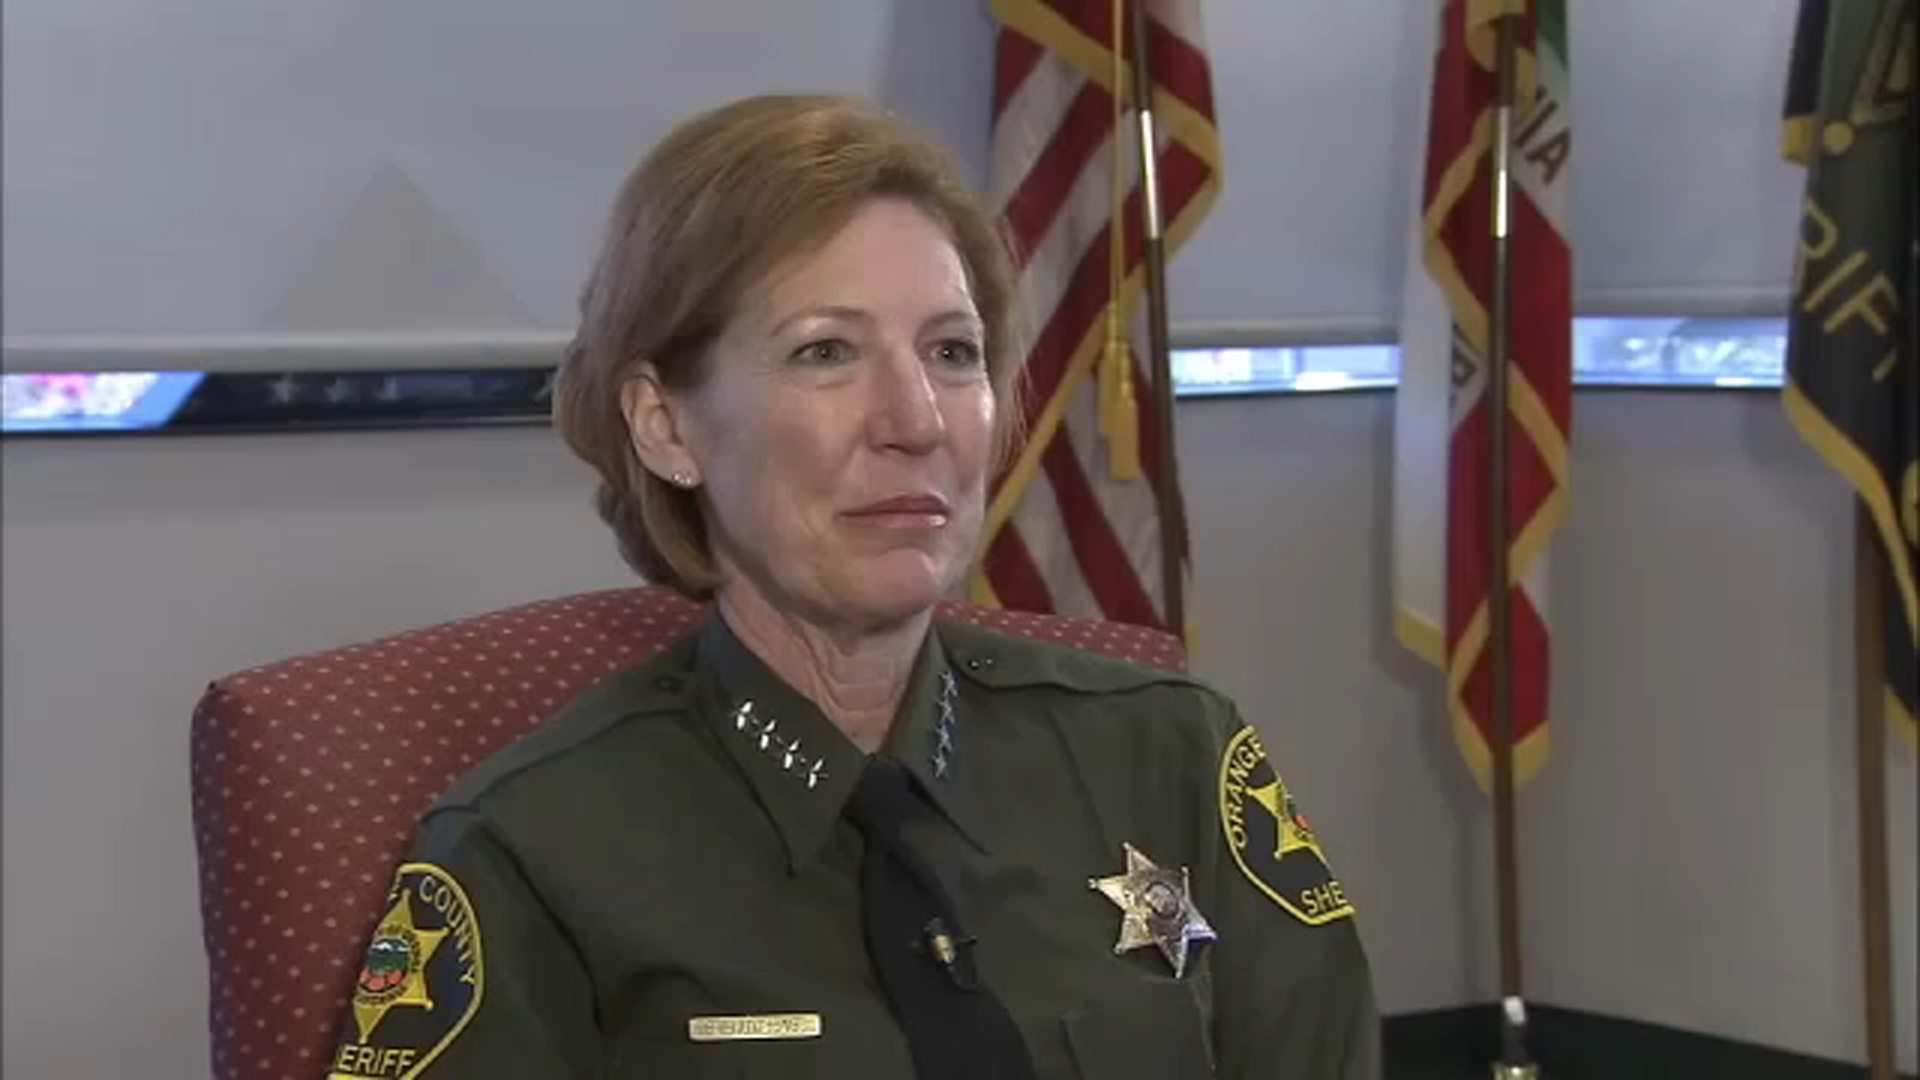 Former OC Sheriff Sandra Hutchens dies after breast cancer battle